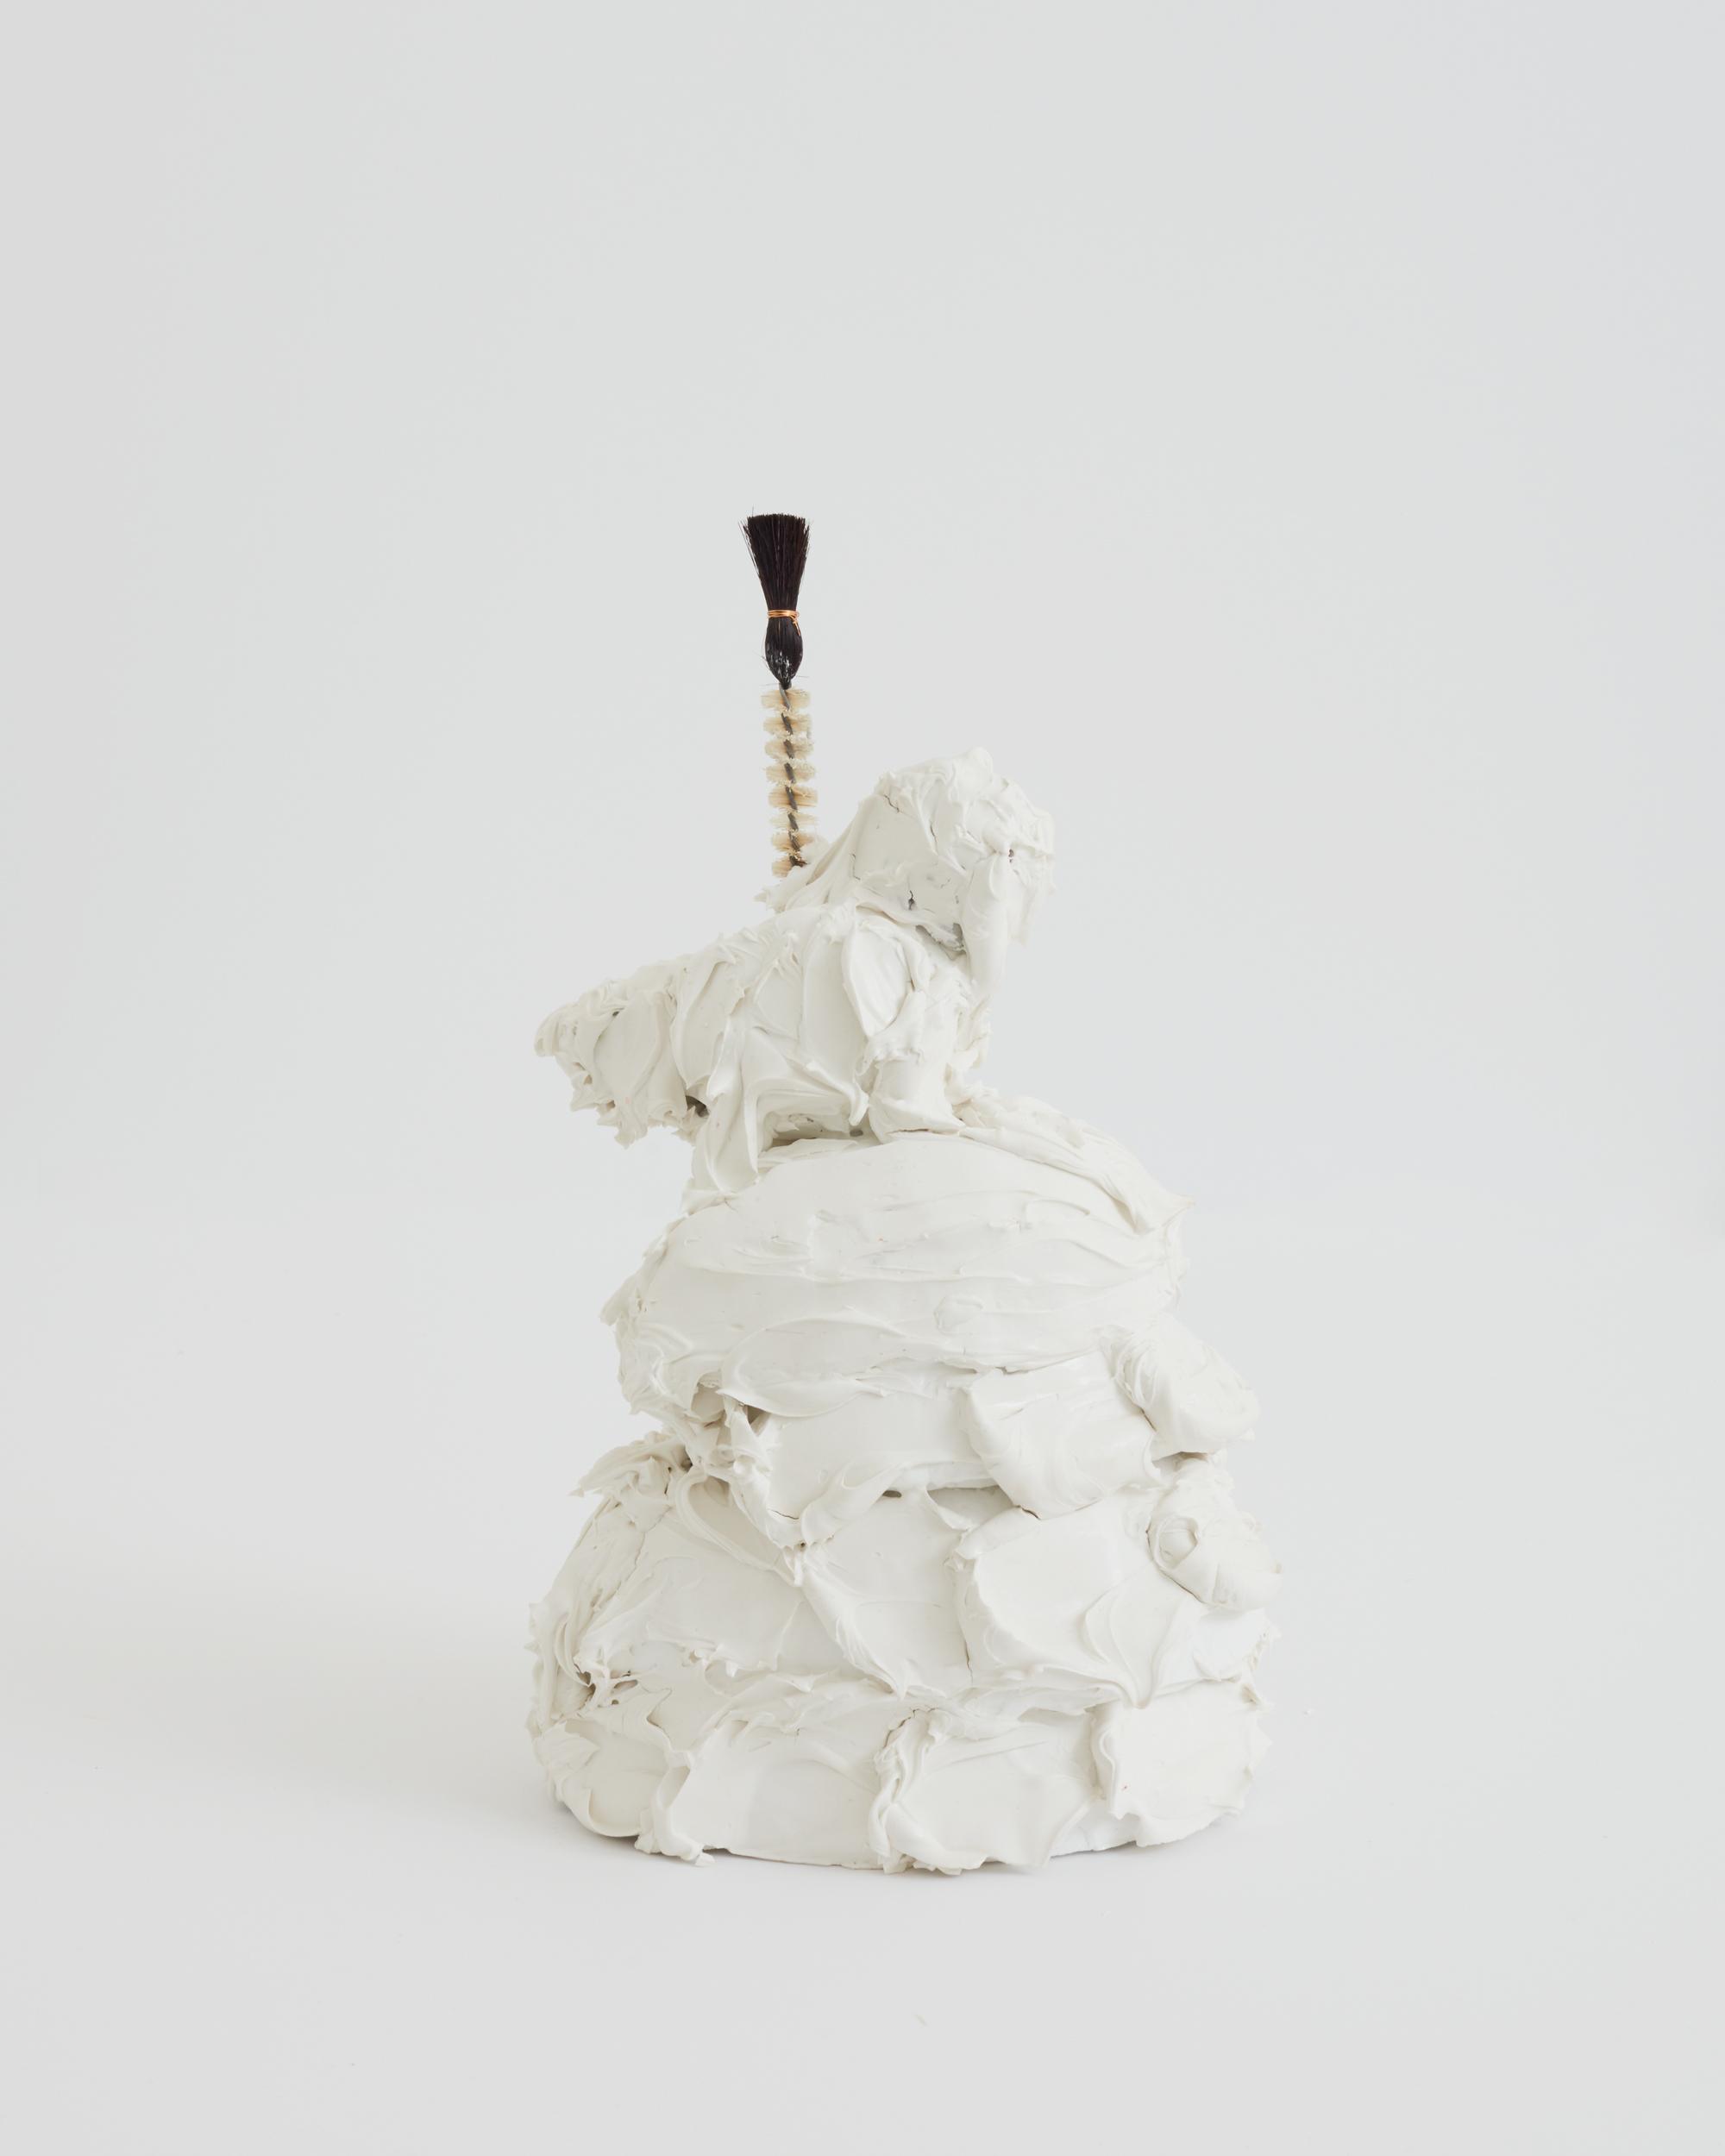 Maryam Keyahni, Twisted_Plaster, epoxy, foam, paints, hand-made brush_36x21x15cm.JPG